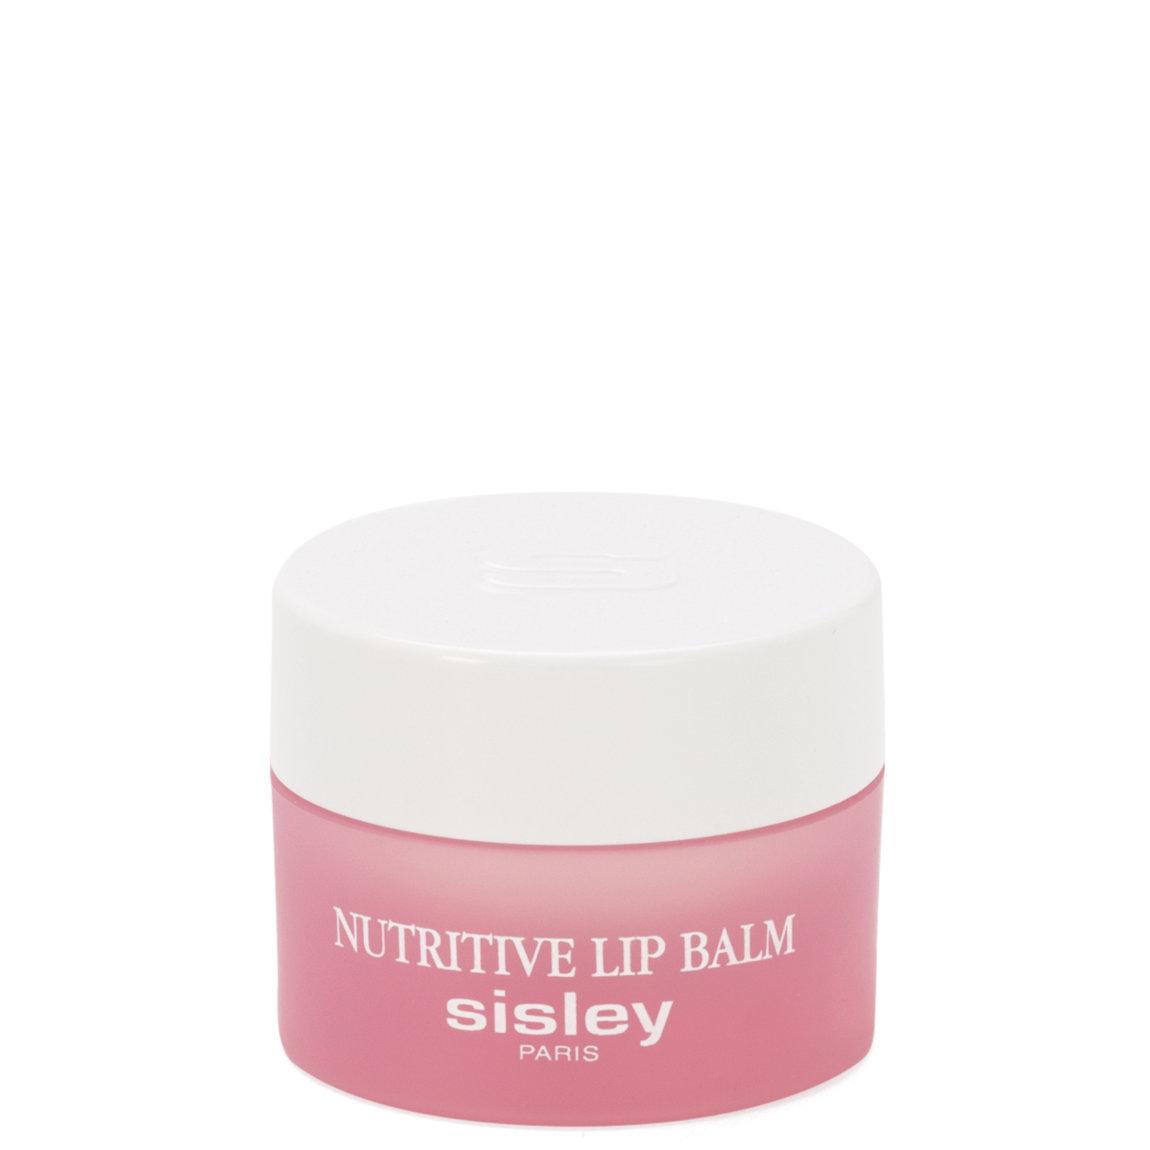 Sisley-Paris Confort Extrême Nutritive Lip Balm alternative view 1 - product swatch.